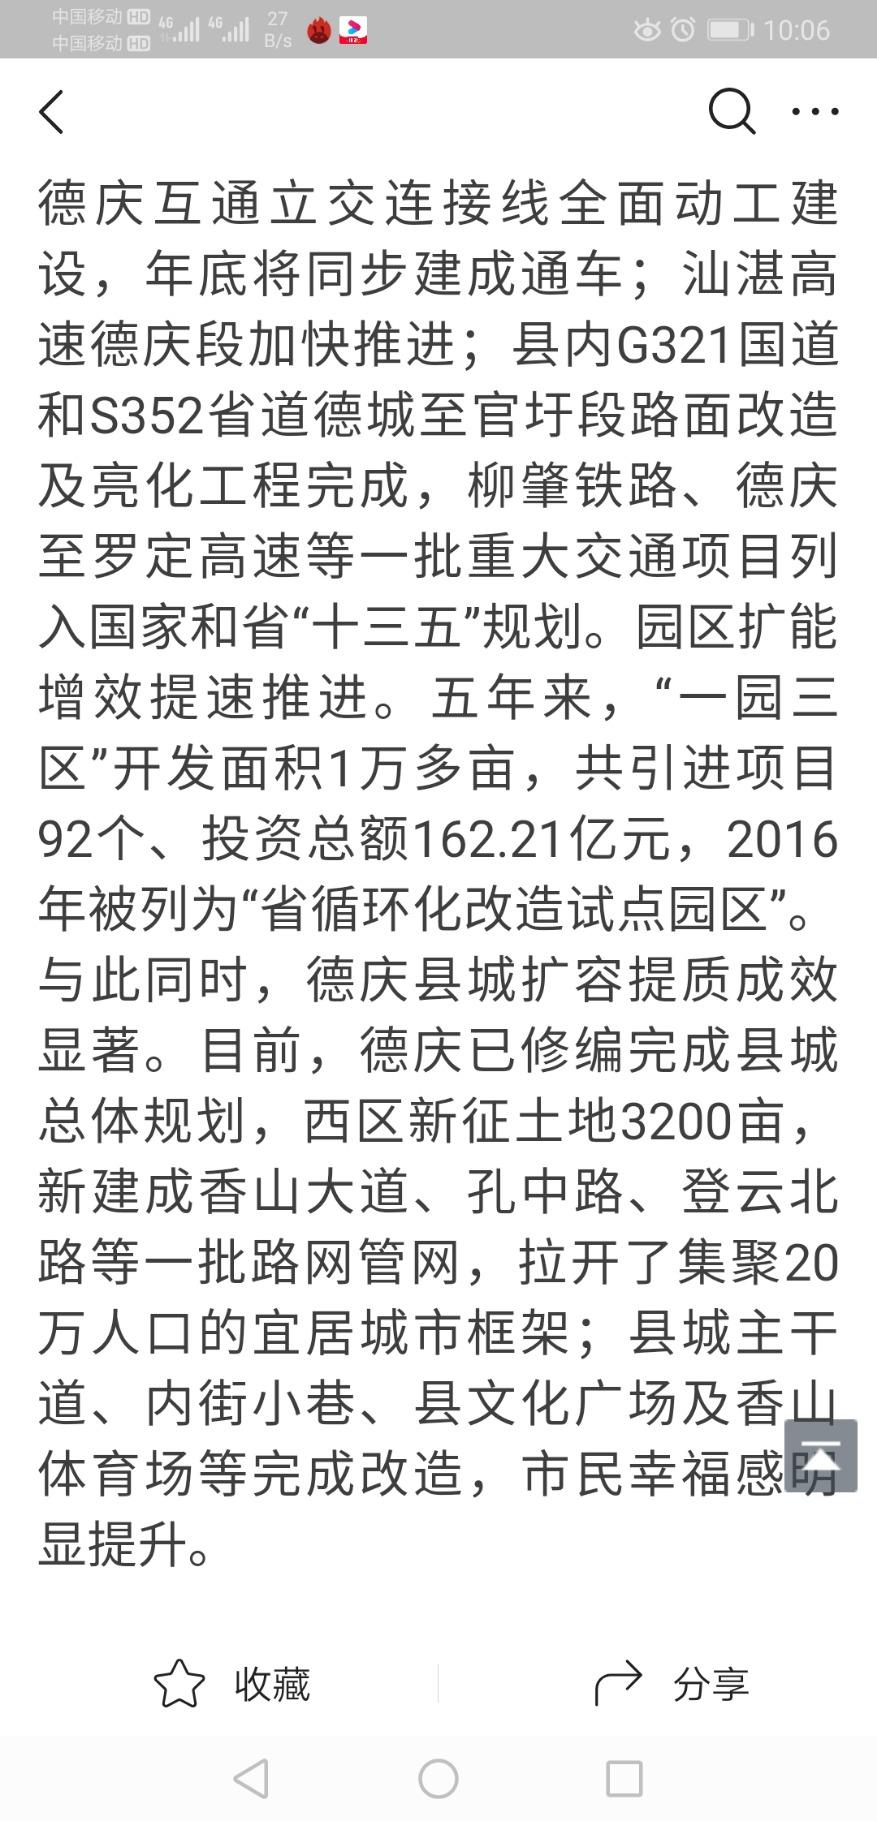 Screenshot_20191204_100622_com.ss.android.article.lite.jpg